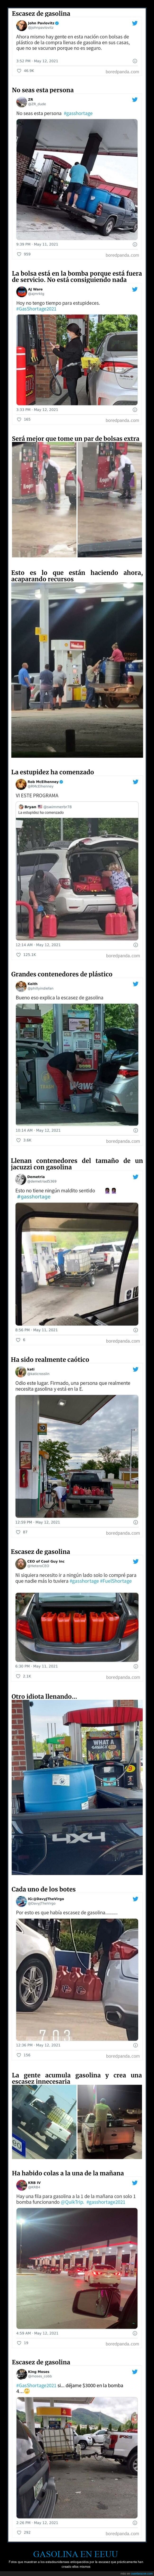 eeuu,escasez,gasolina